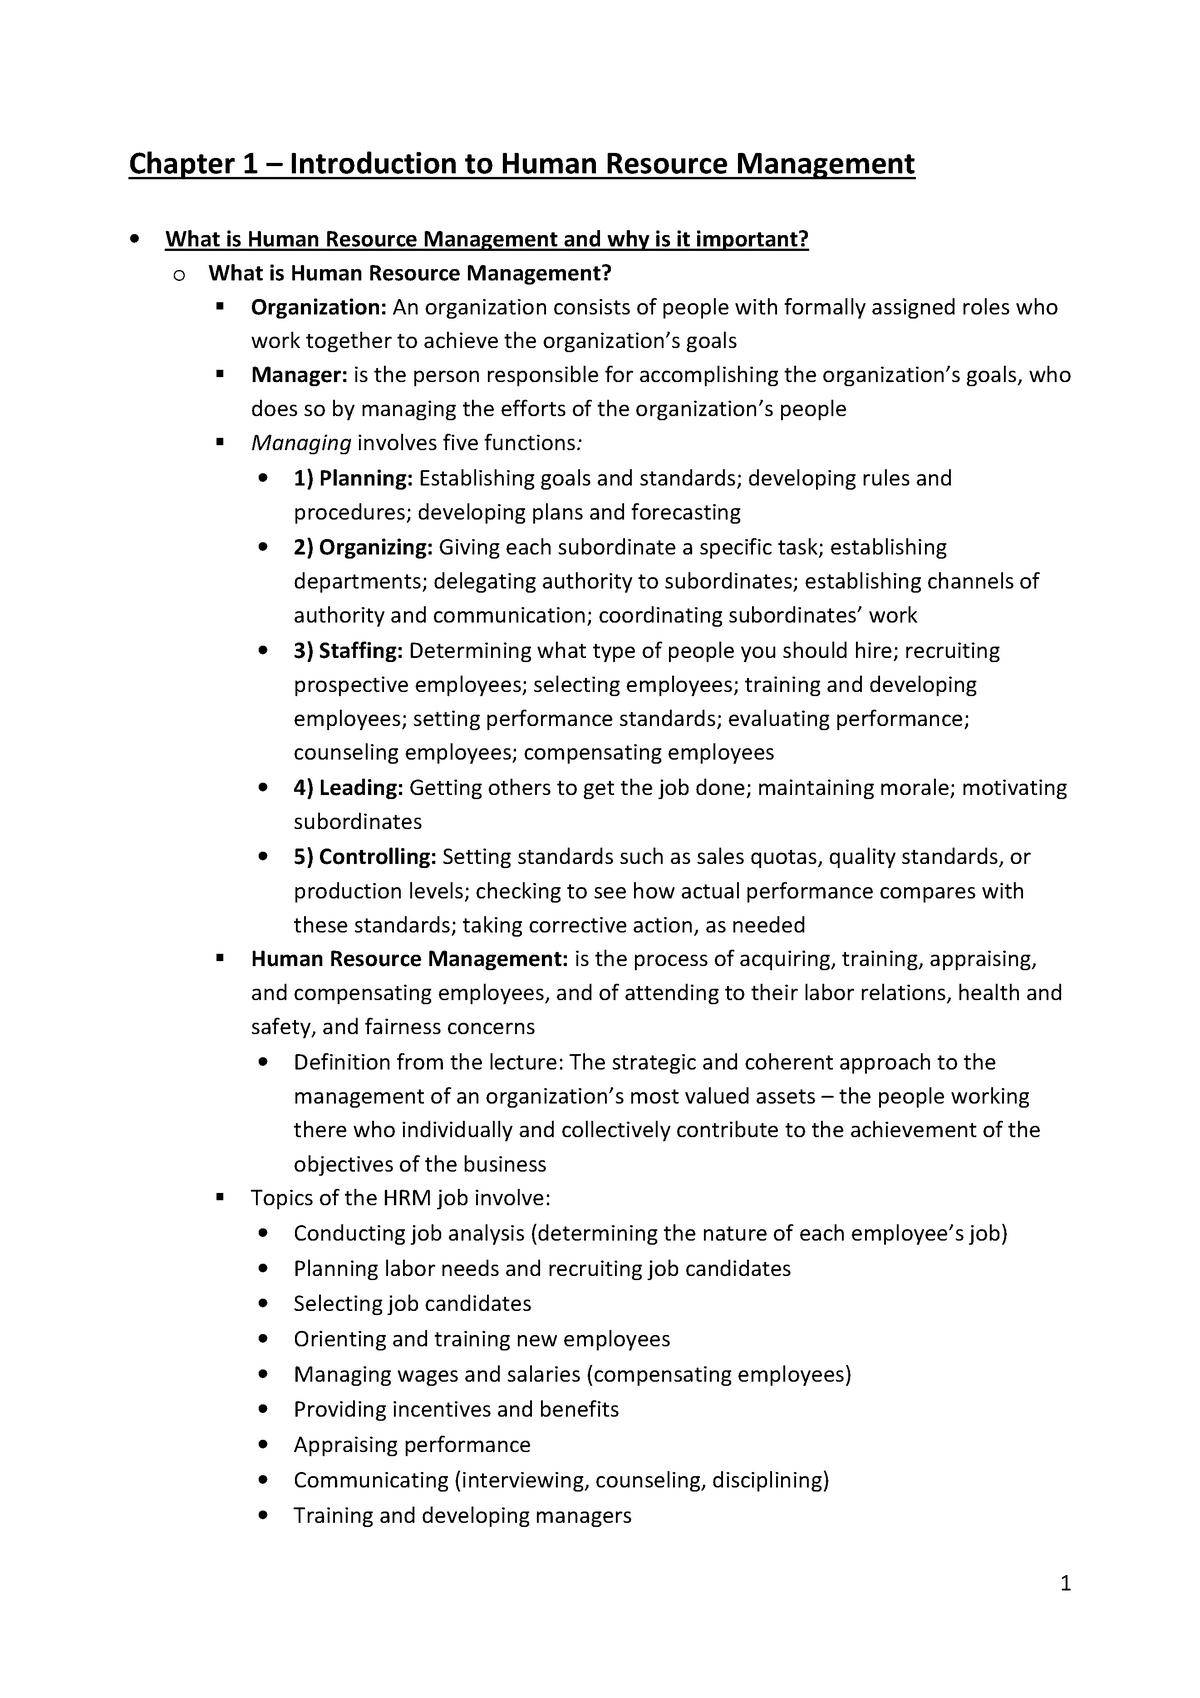 Summary Human Resource Management, H1-18 - P_BHRMANA